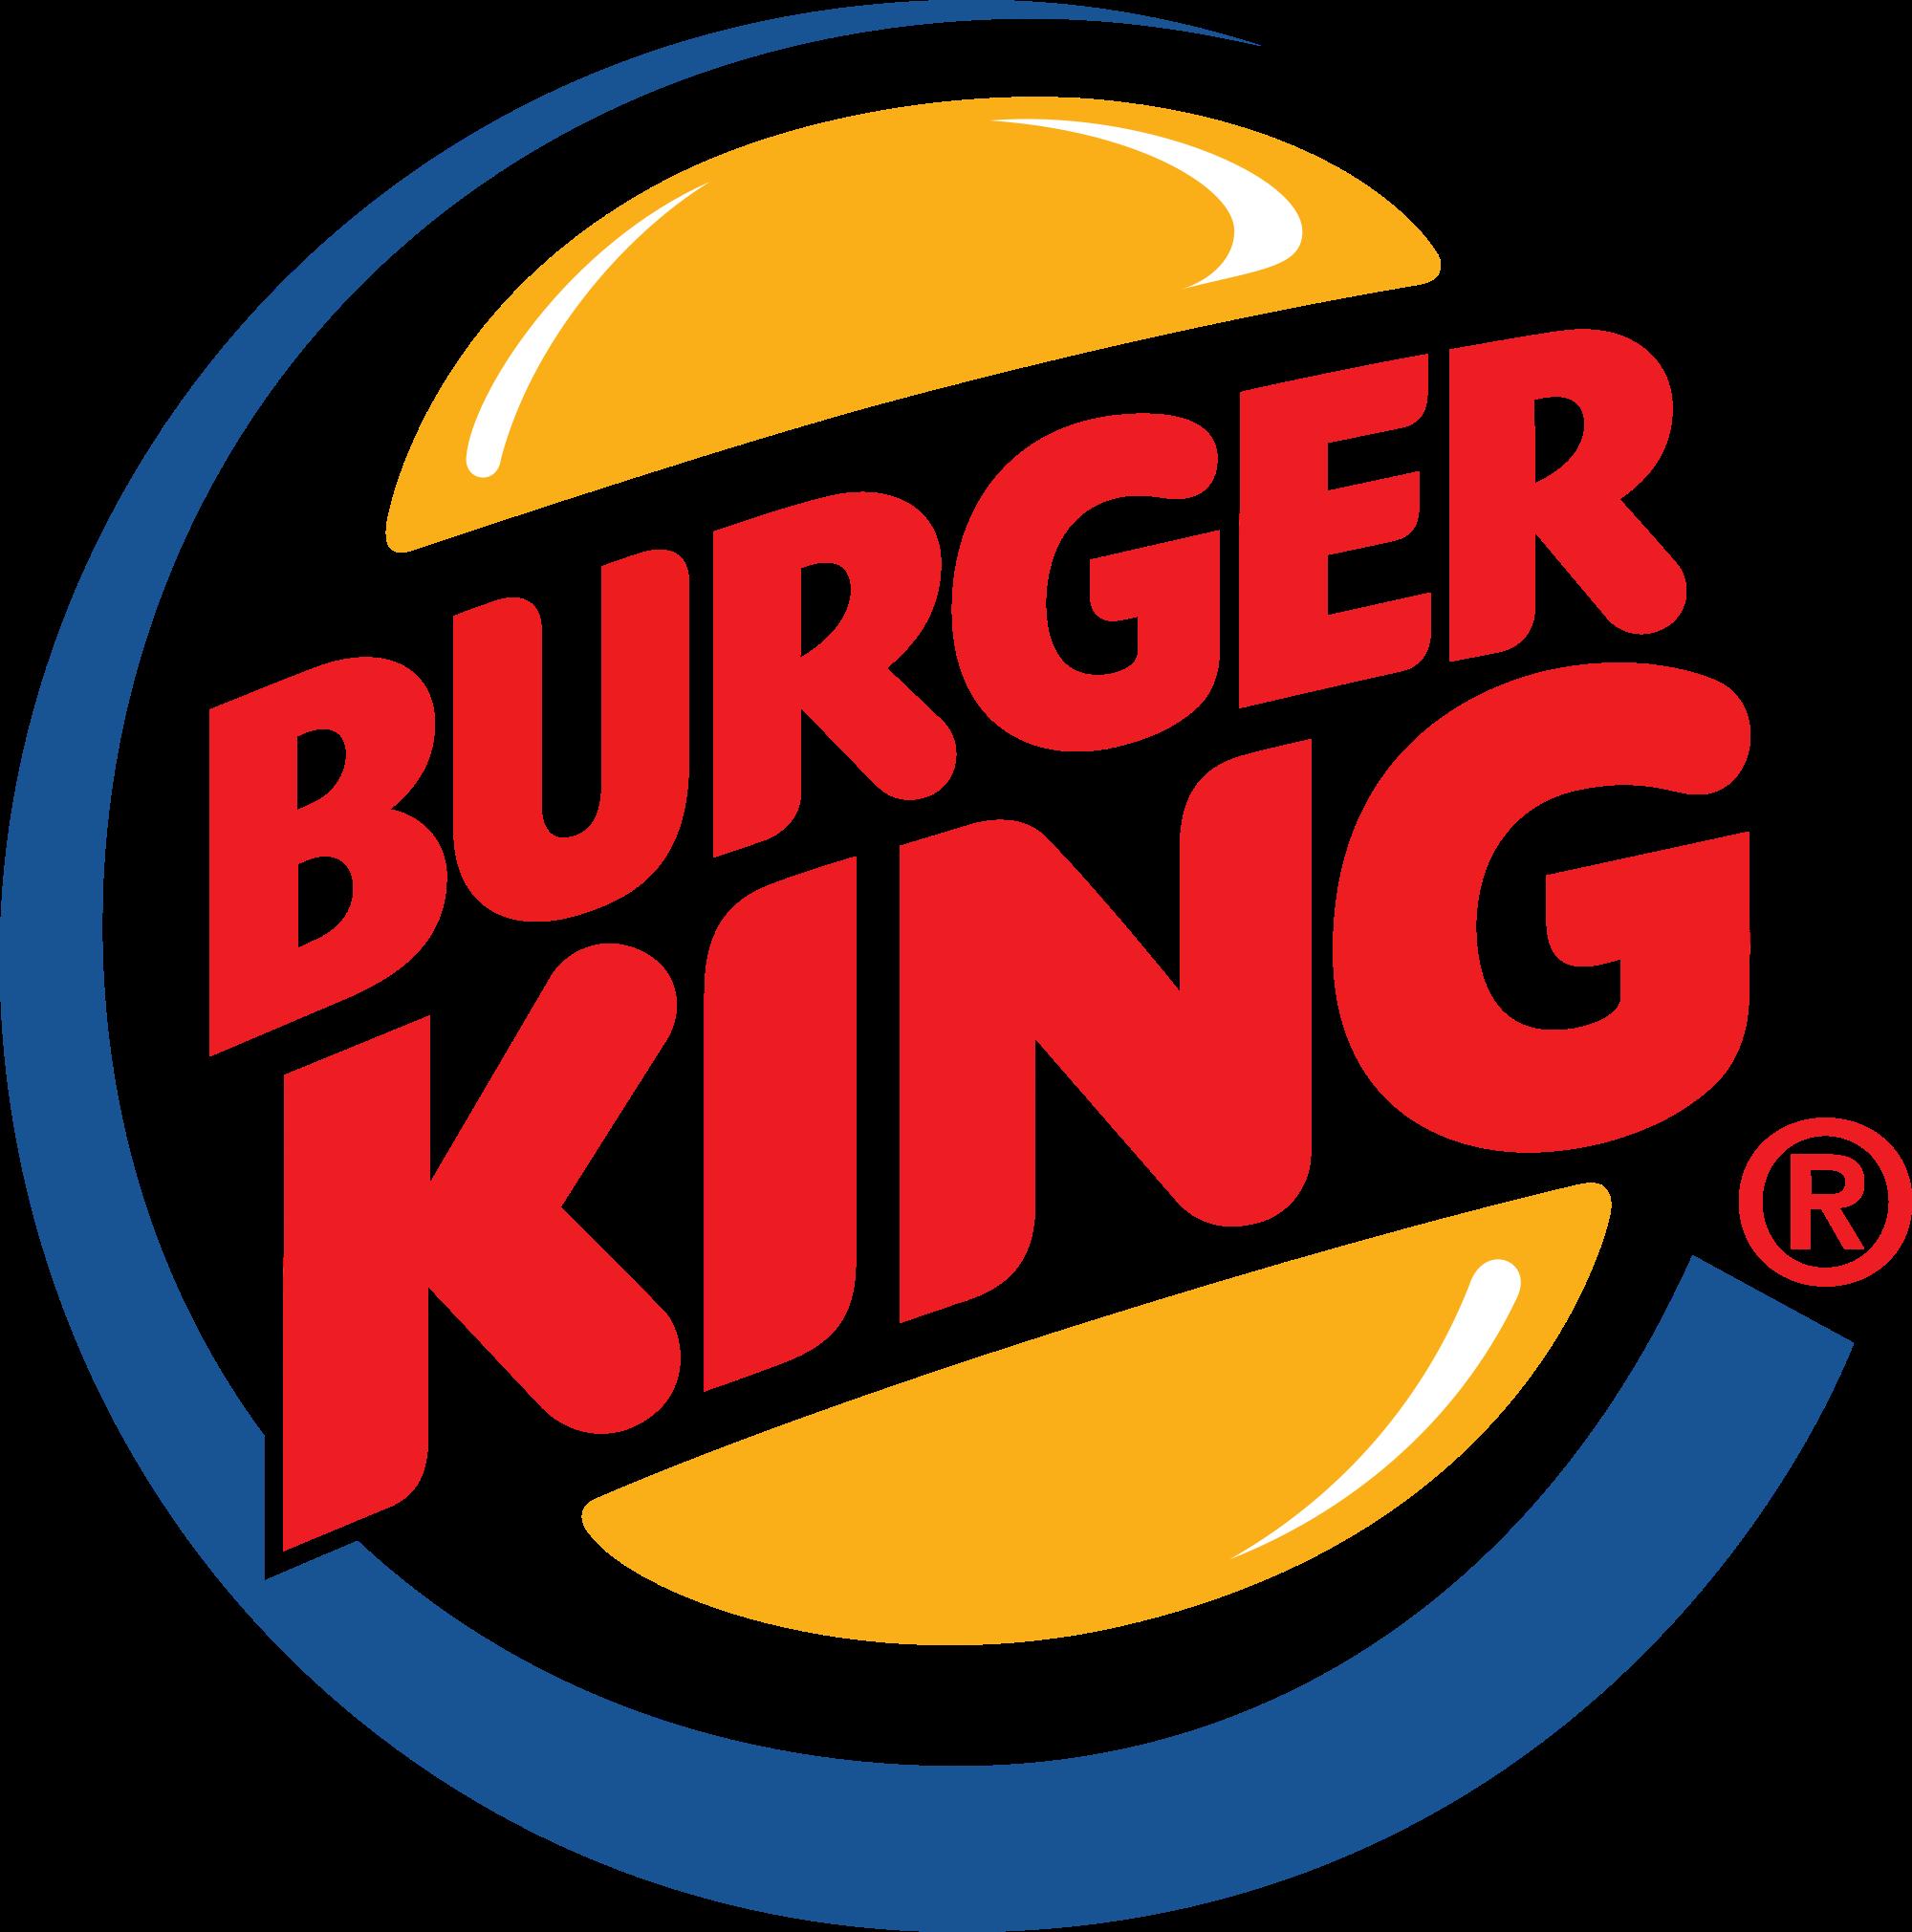 Burger King - Dhillon Silicon Square Mall - Zirakpur - Chandigarh Image